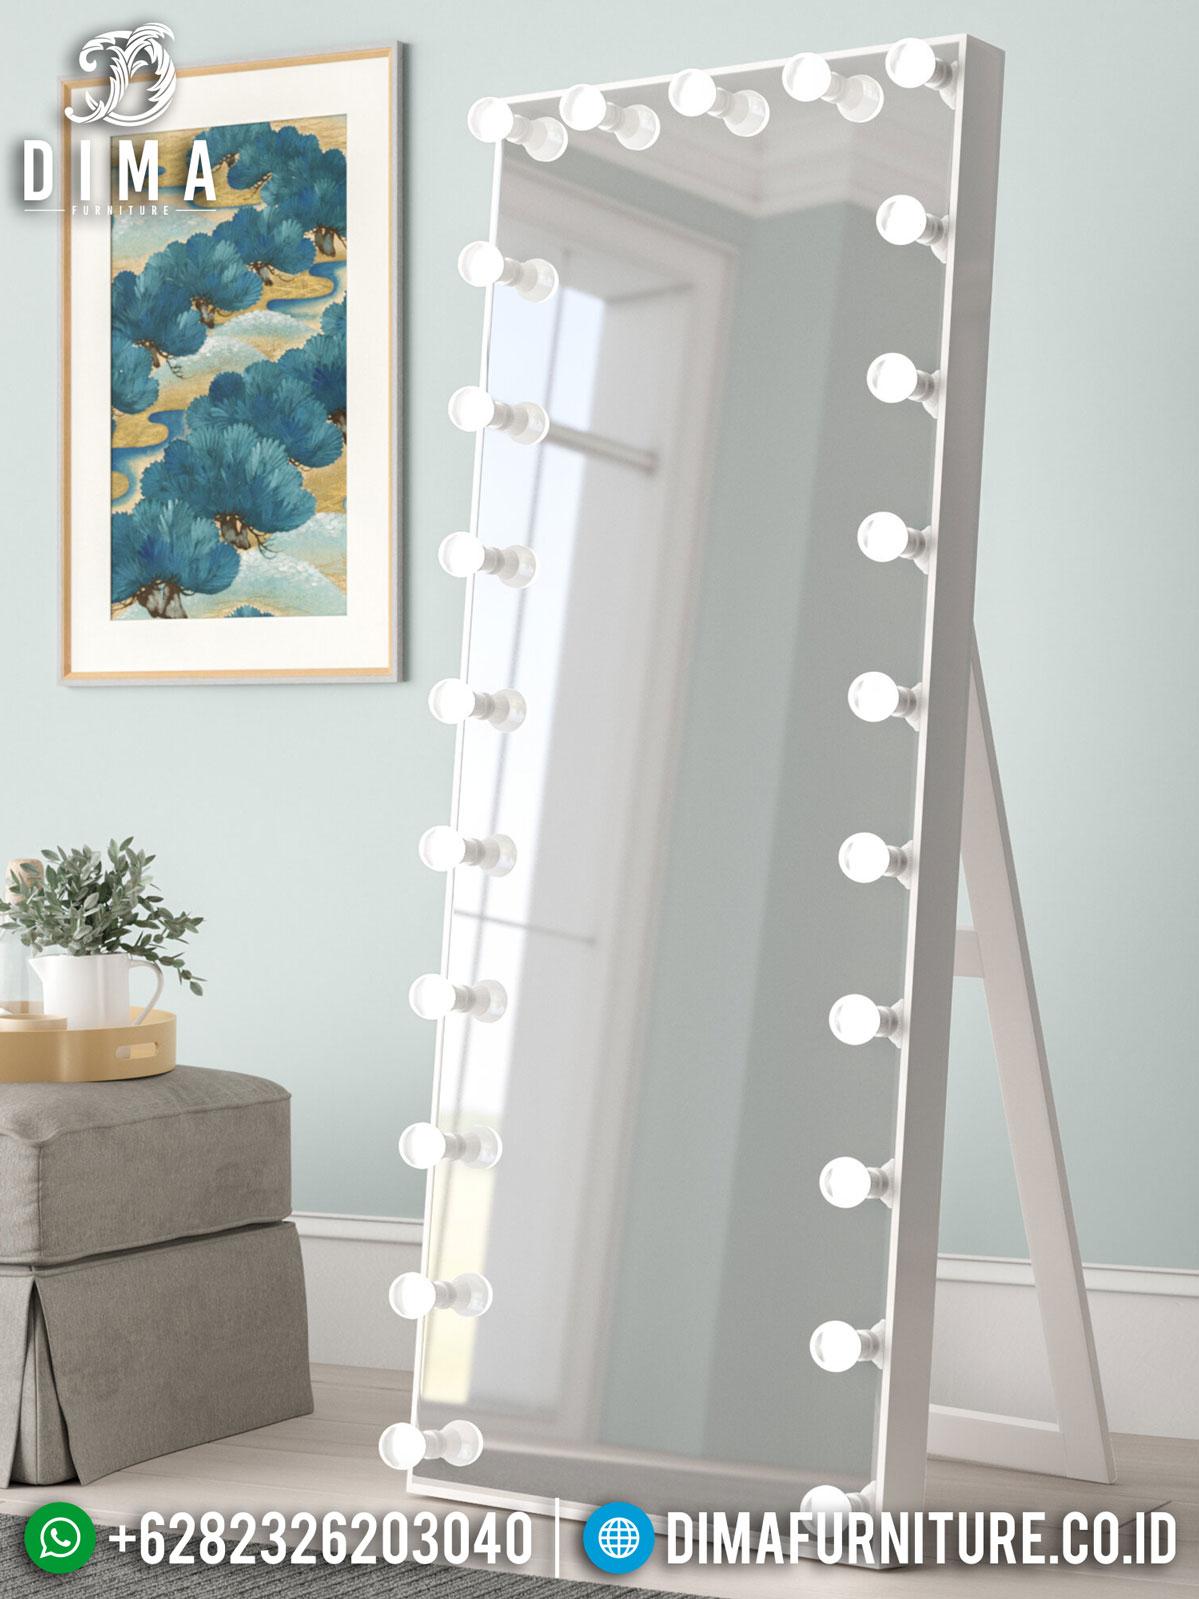 Stand Mirror Minimalis Lamp Modern Design New Style Vanity Room TTJ-1296